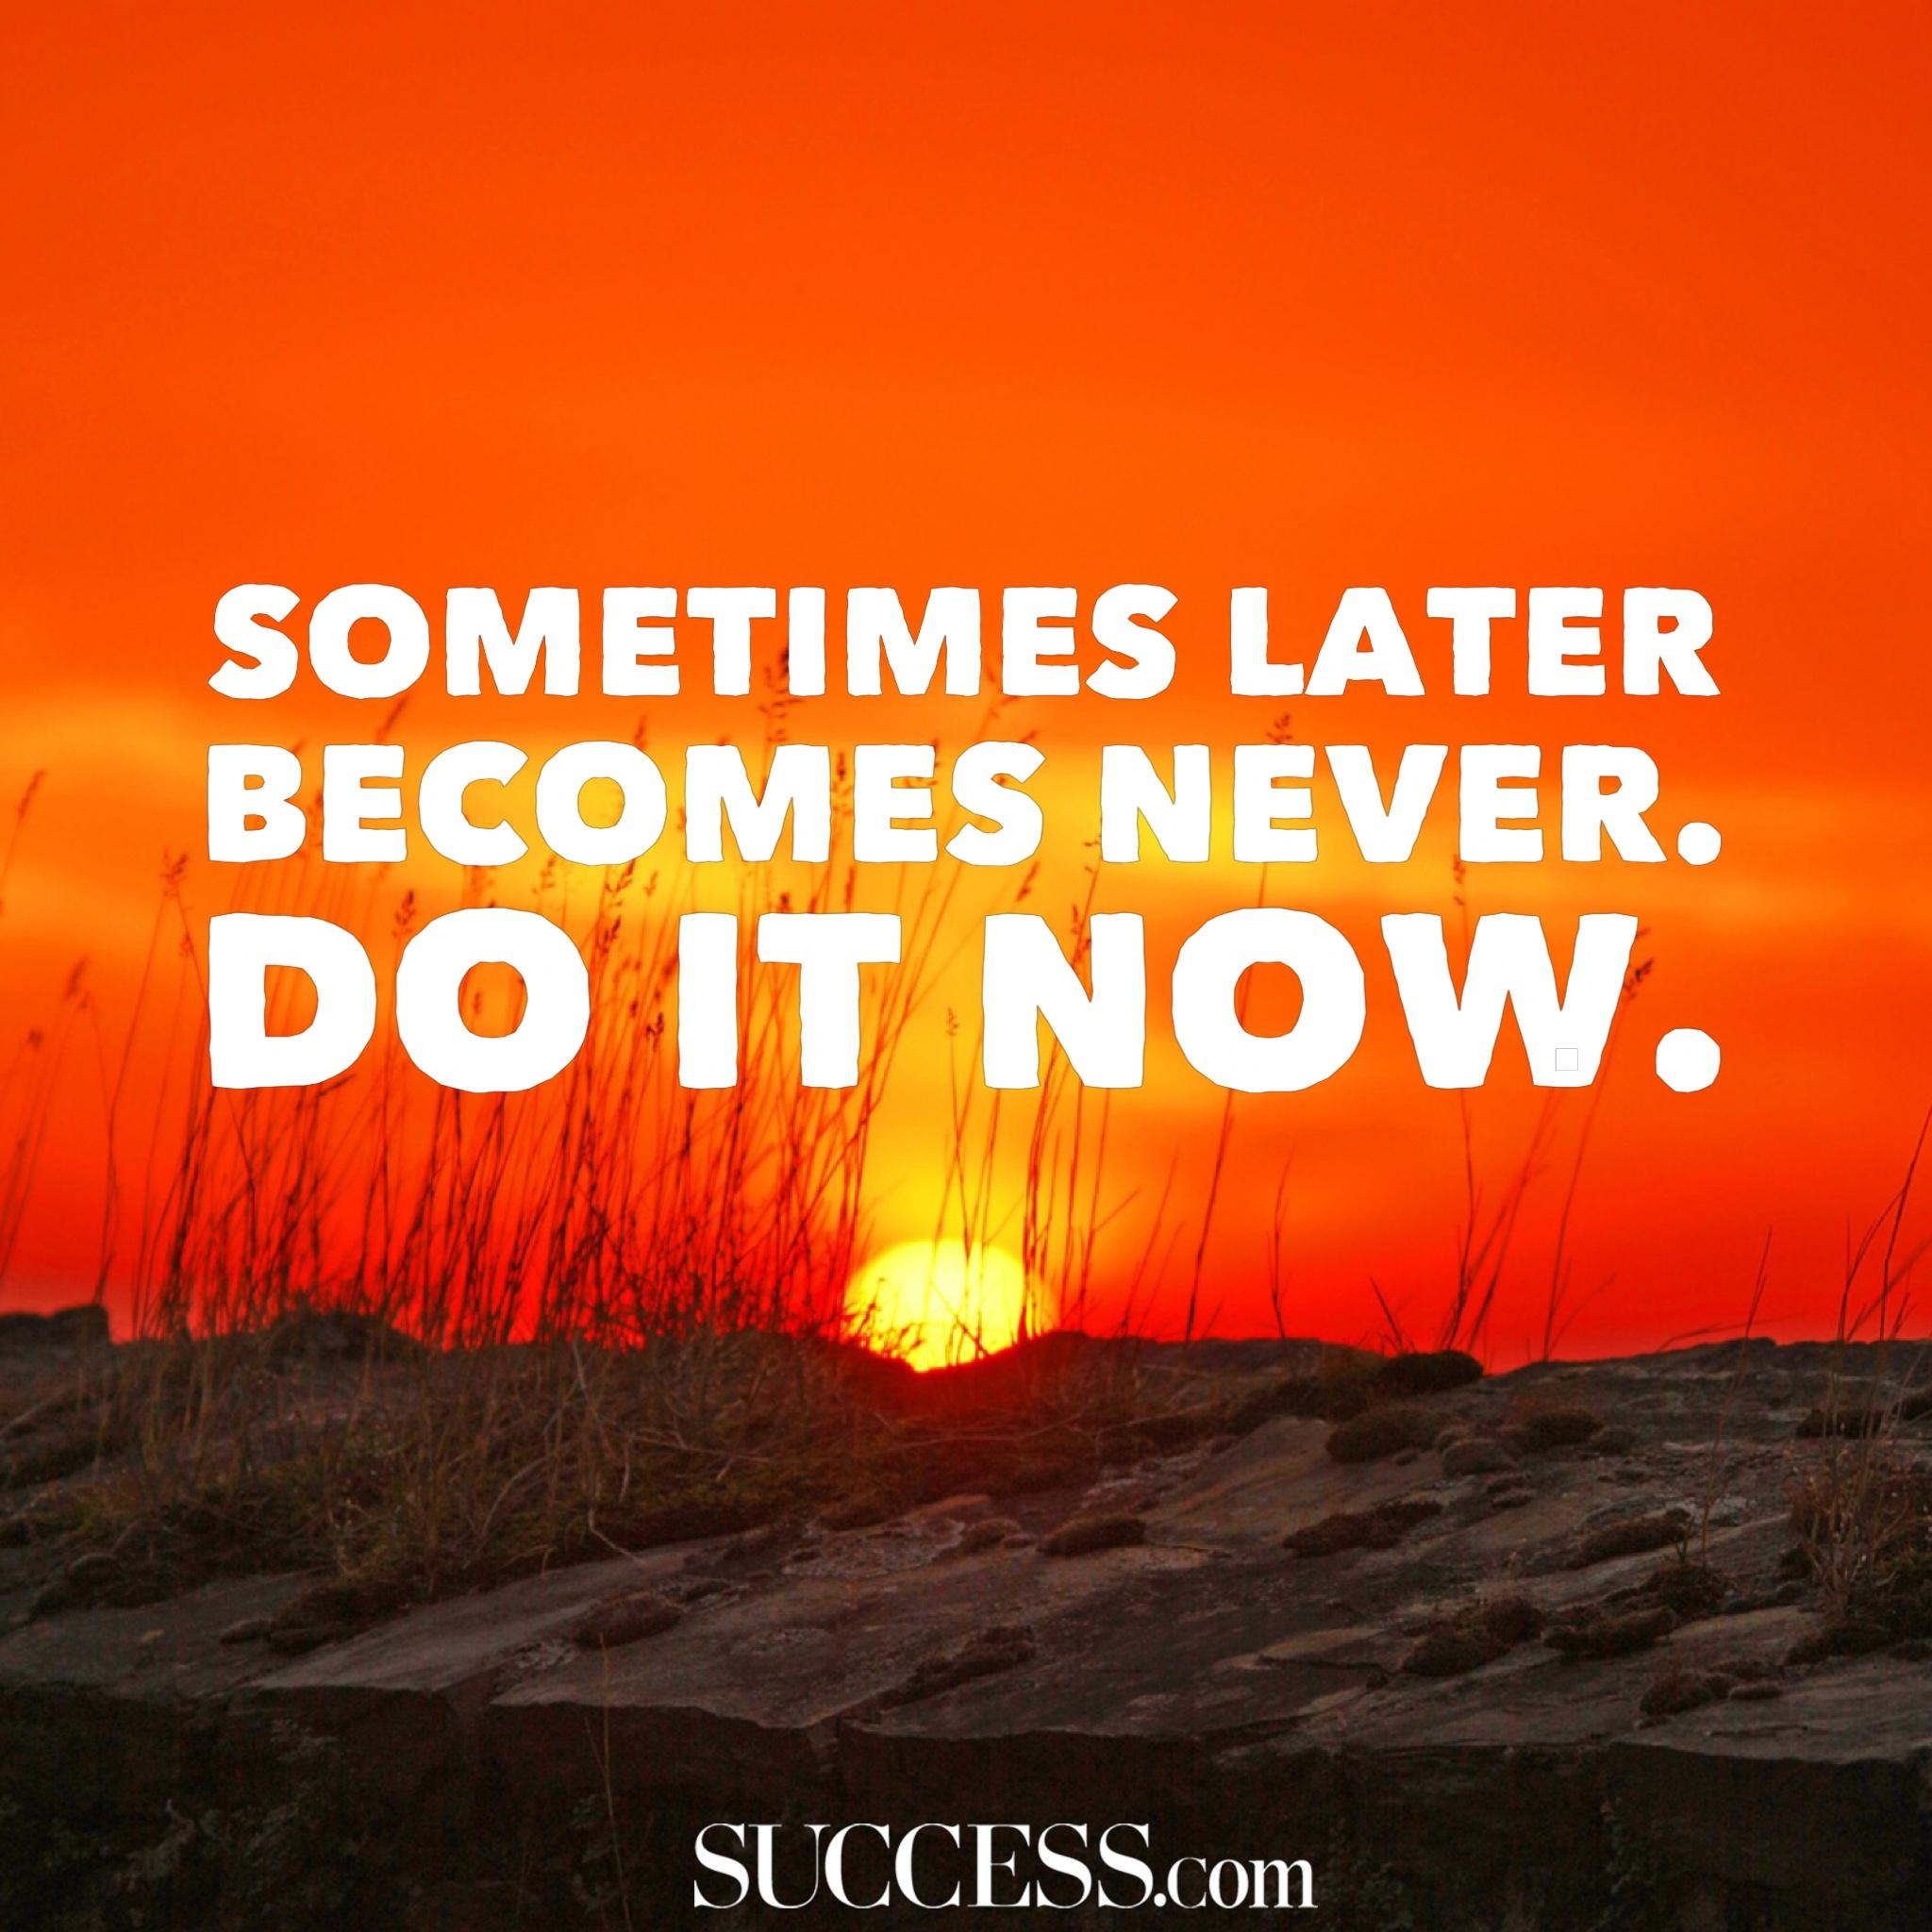 [Image] Stop Procrastinating.